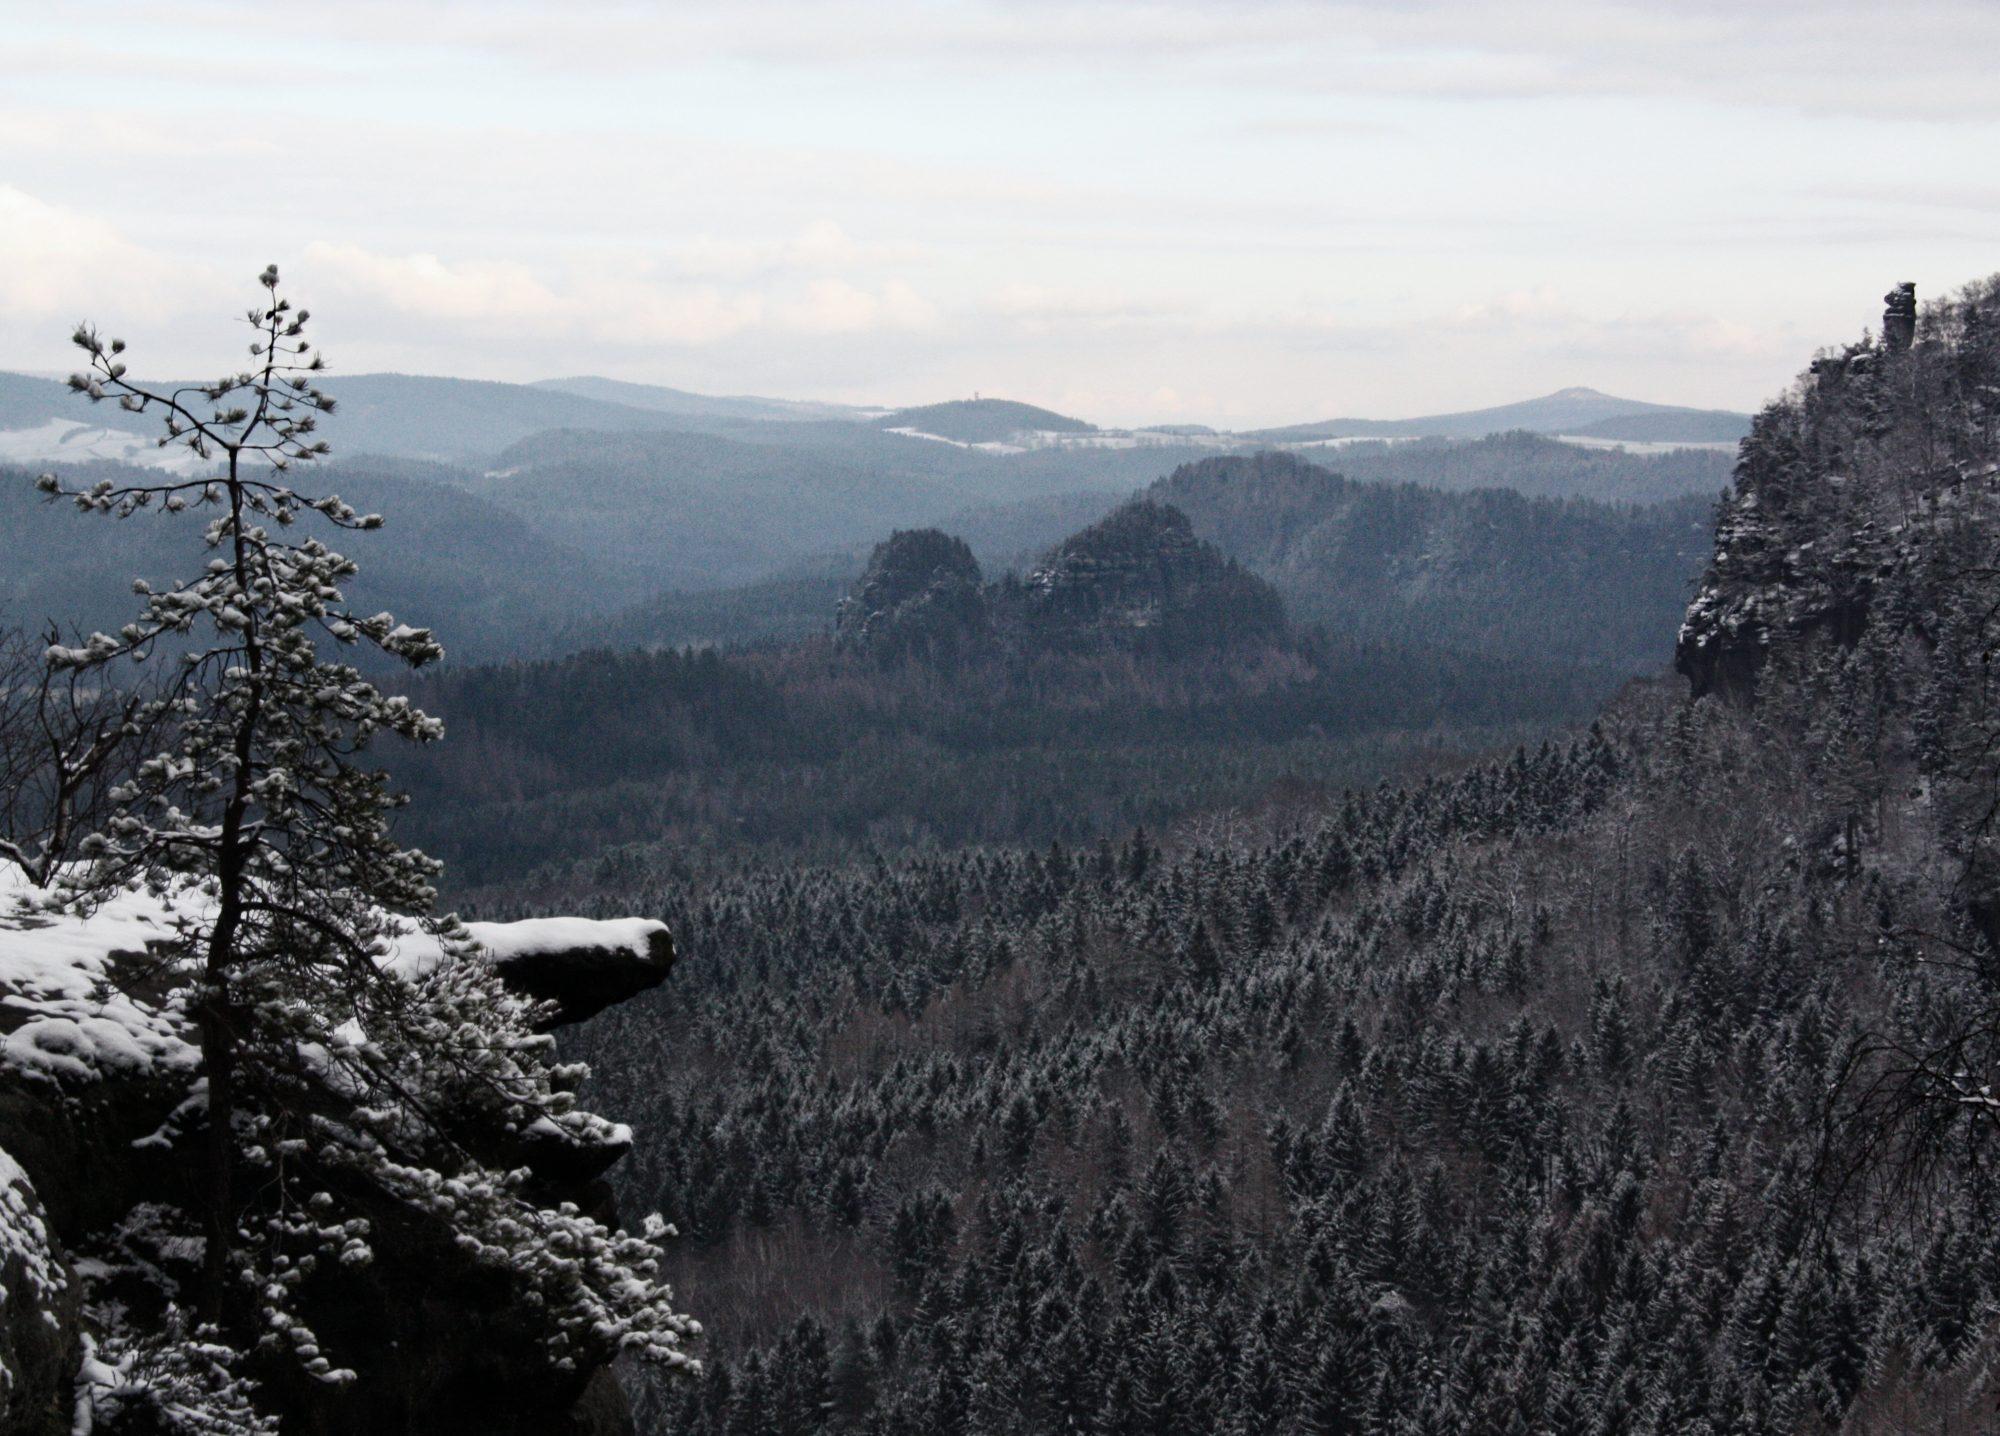 Idagrotte, Elbsandsteingebirge, Sächsische Schweiz, Wandern, Wandertour